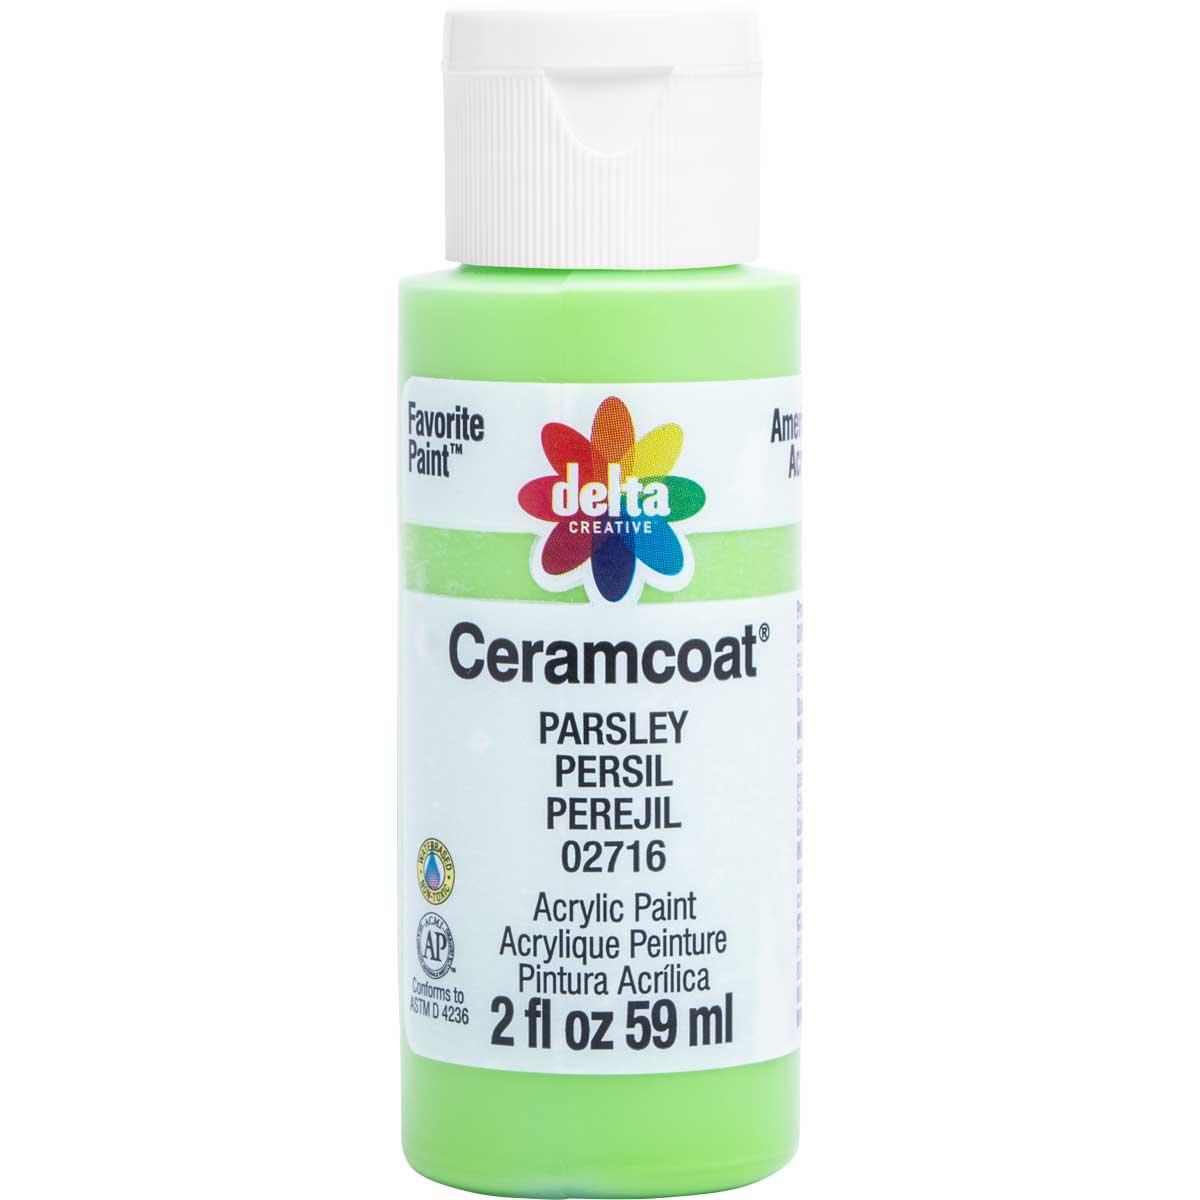 Delta Ceramcoat ® Acrylic Paint - Parsley, 2 oz. - 02716